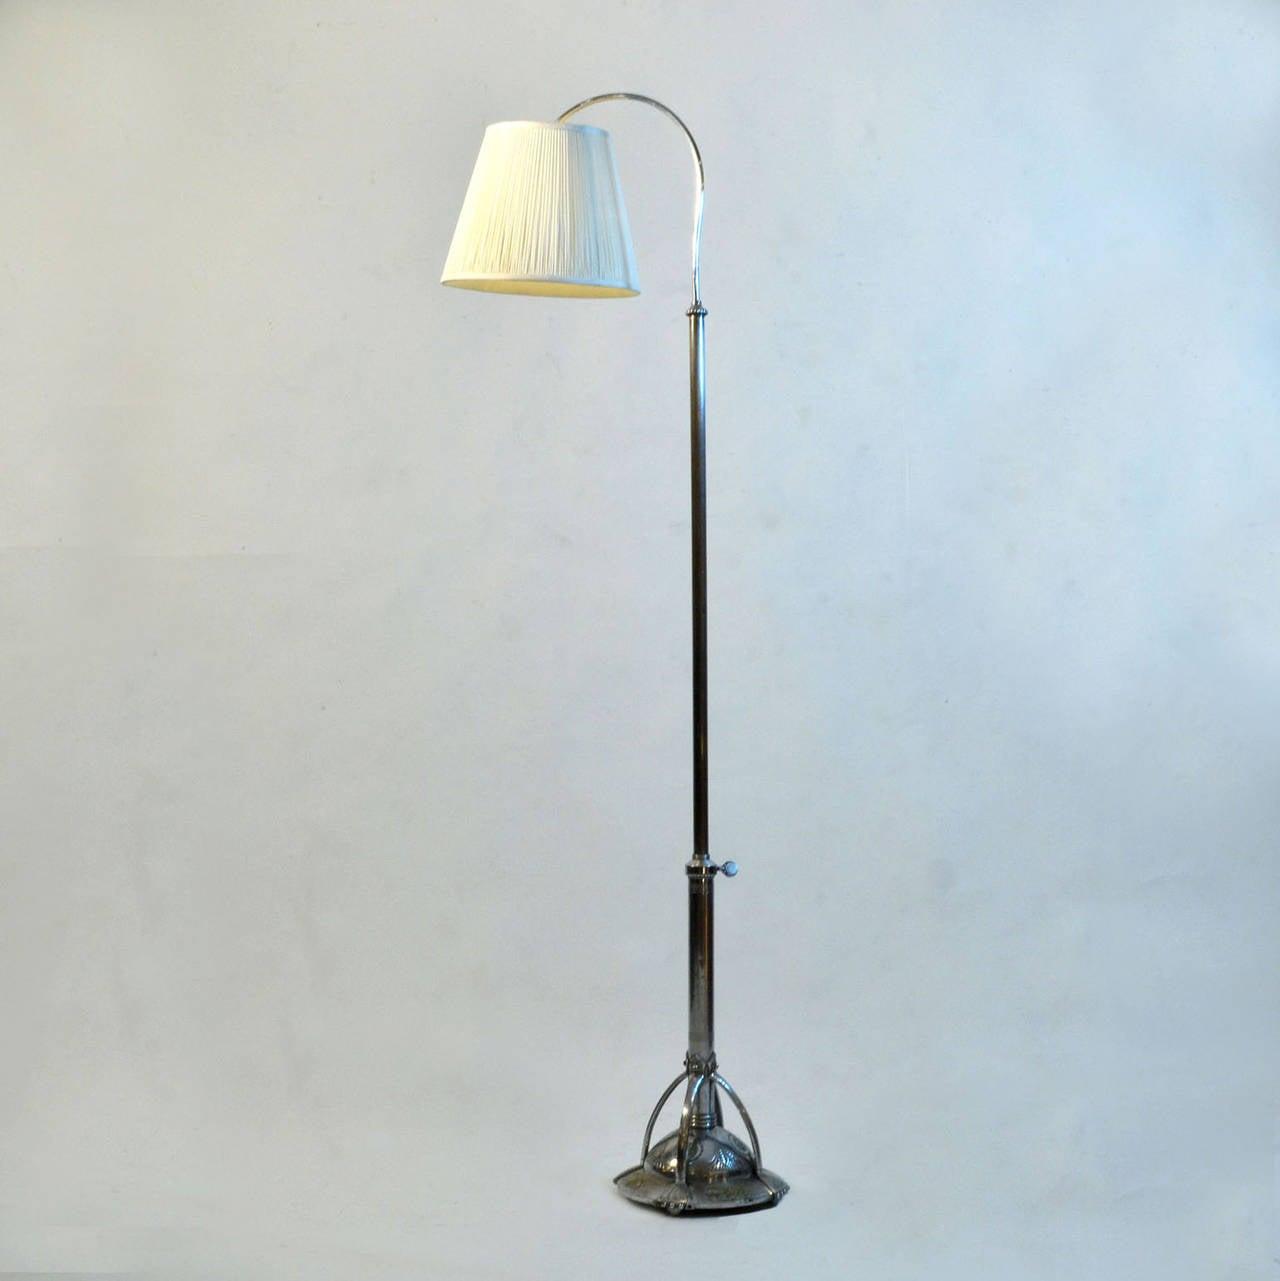 rare art deco floor lamp at 1stdibs. Black Bedroom Furniture Sets. Home Design Ideas